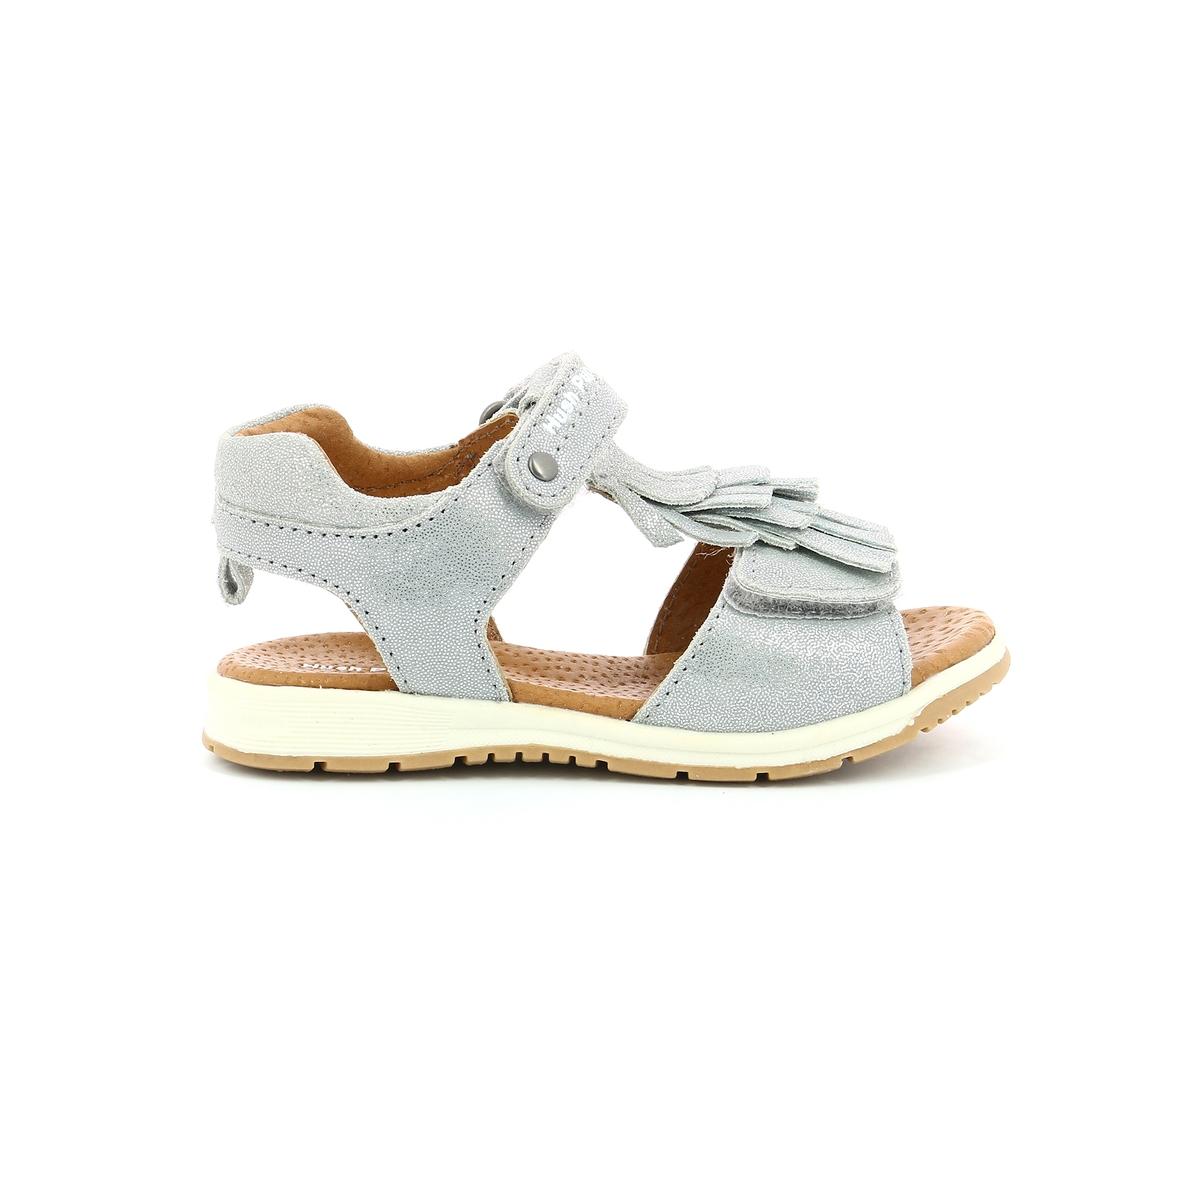 zapatillas Sandalias de piel Jania